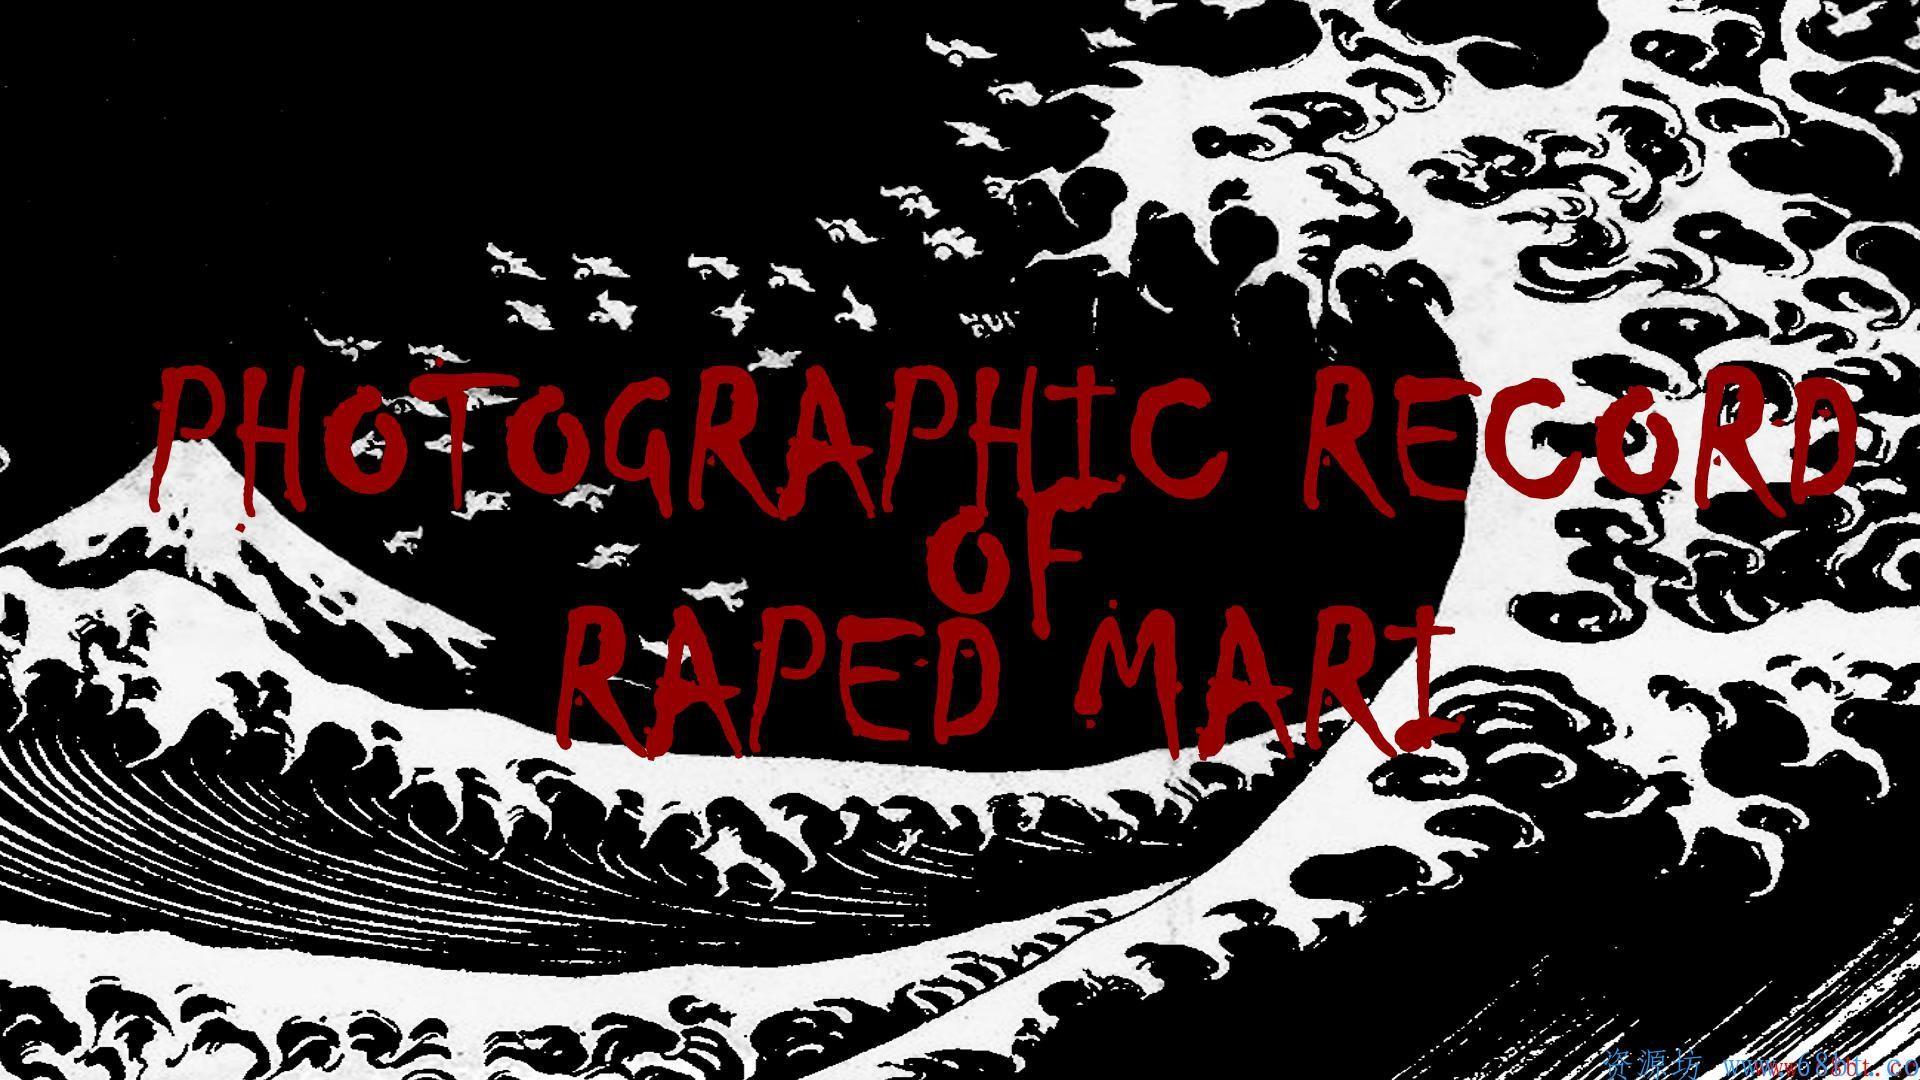 [同人CG集] [Heroineism] Photographic Record of Raped Mari,01_Title.jpg,第2张